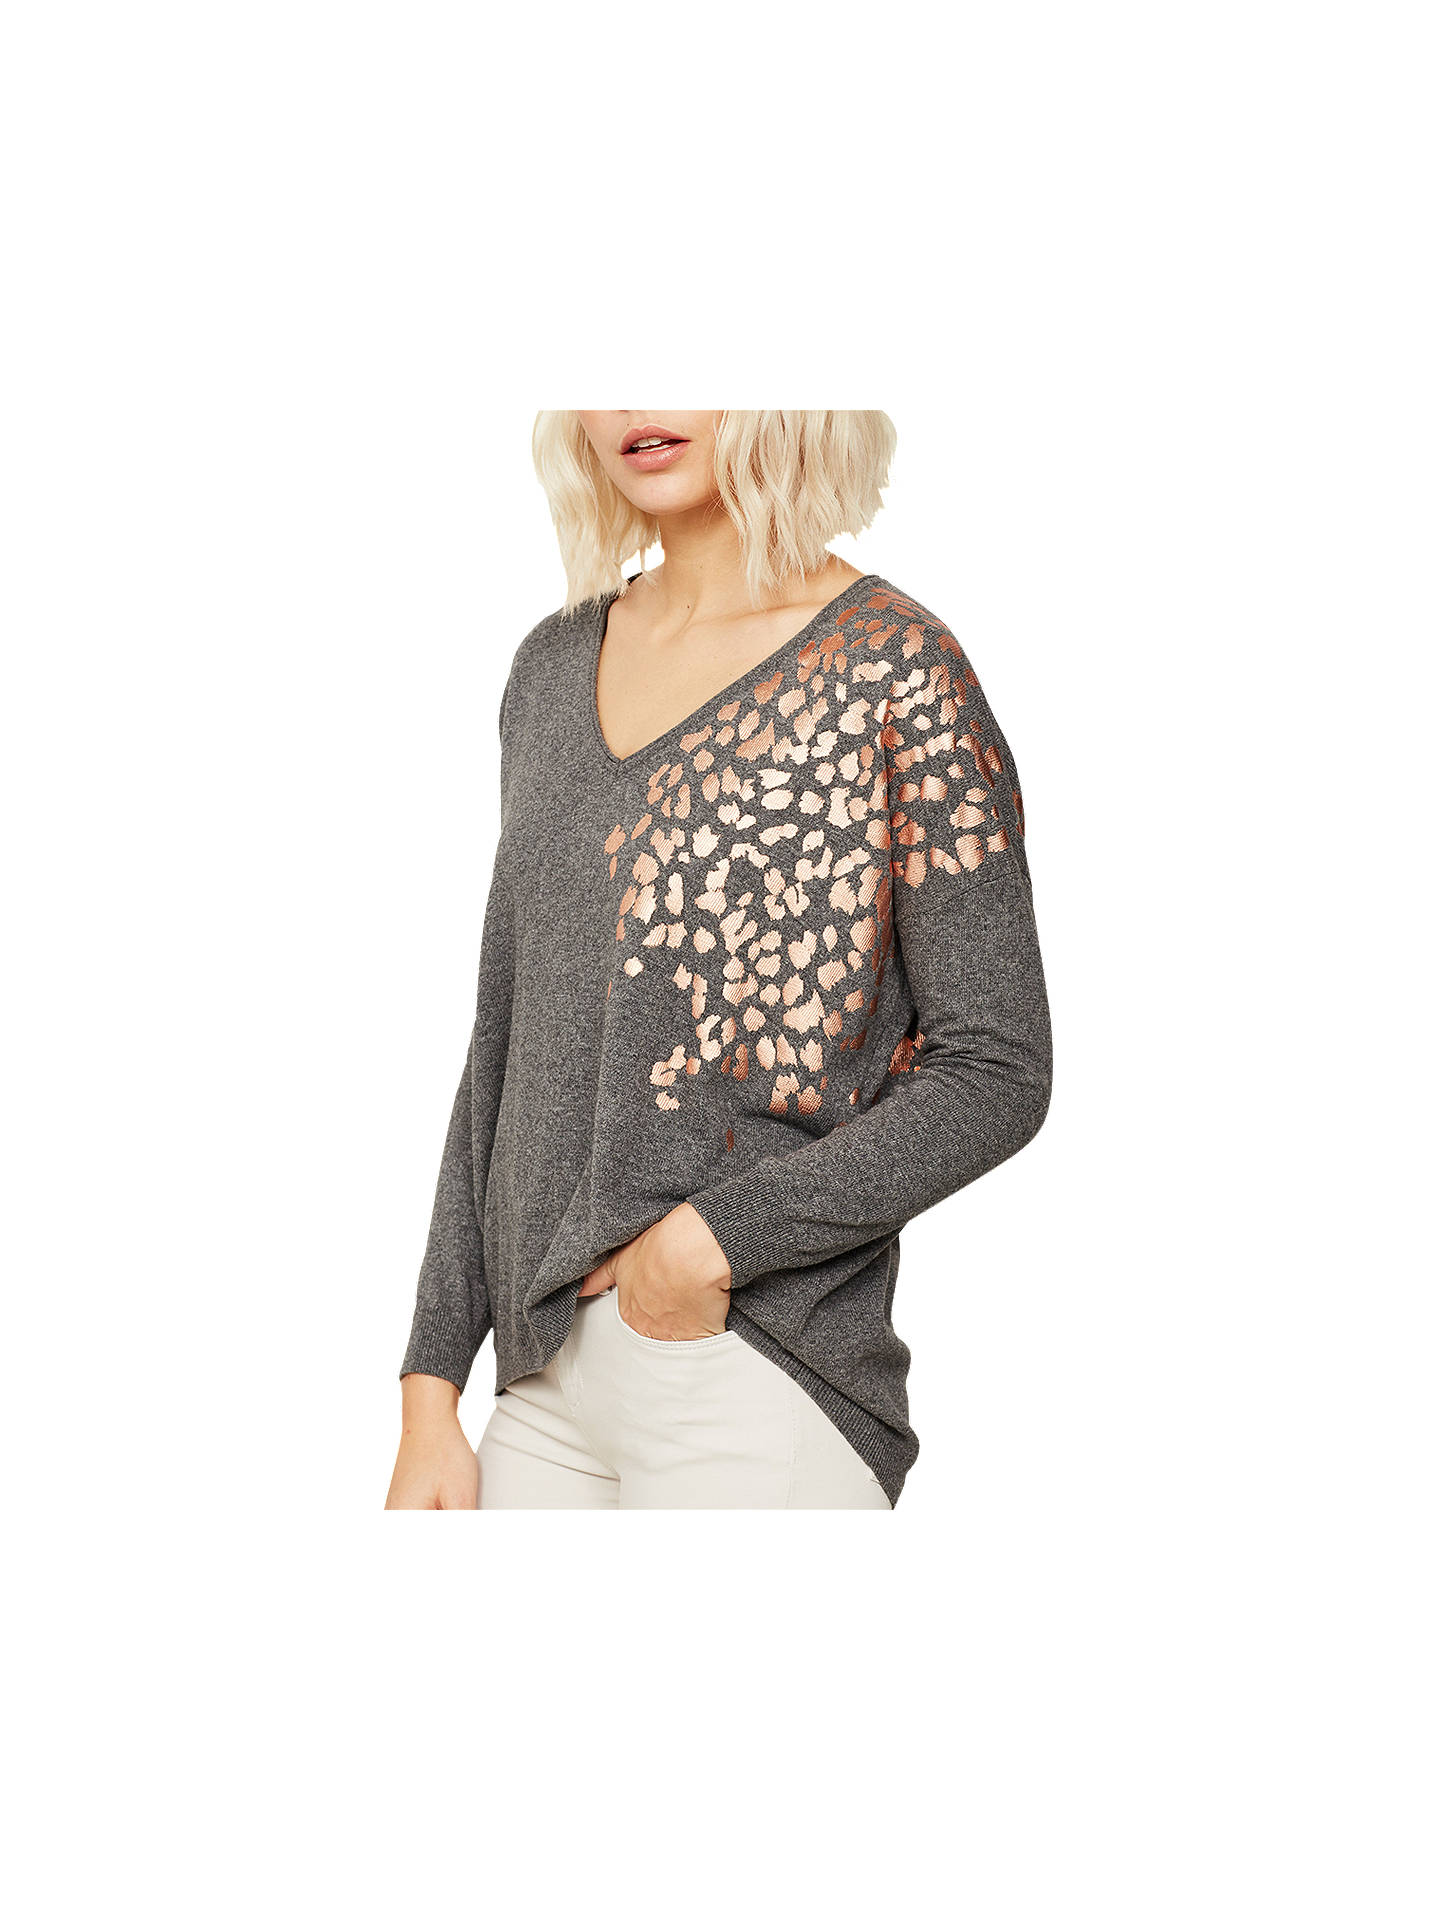 8da7bfba3186 Buy Mint Velvet Foil Leopard Jumper, Granite, XS Online at johnlewis.com ...